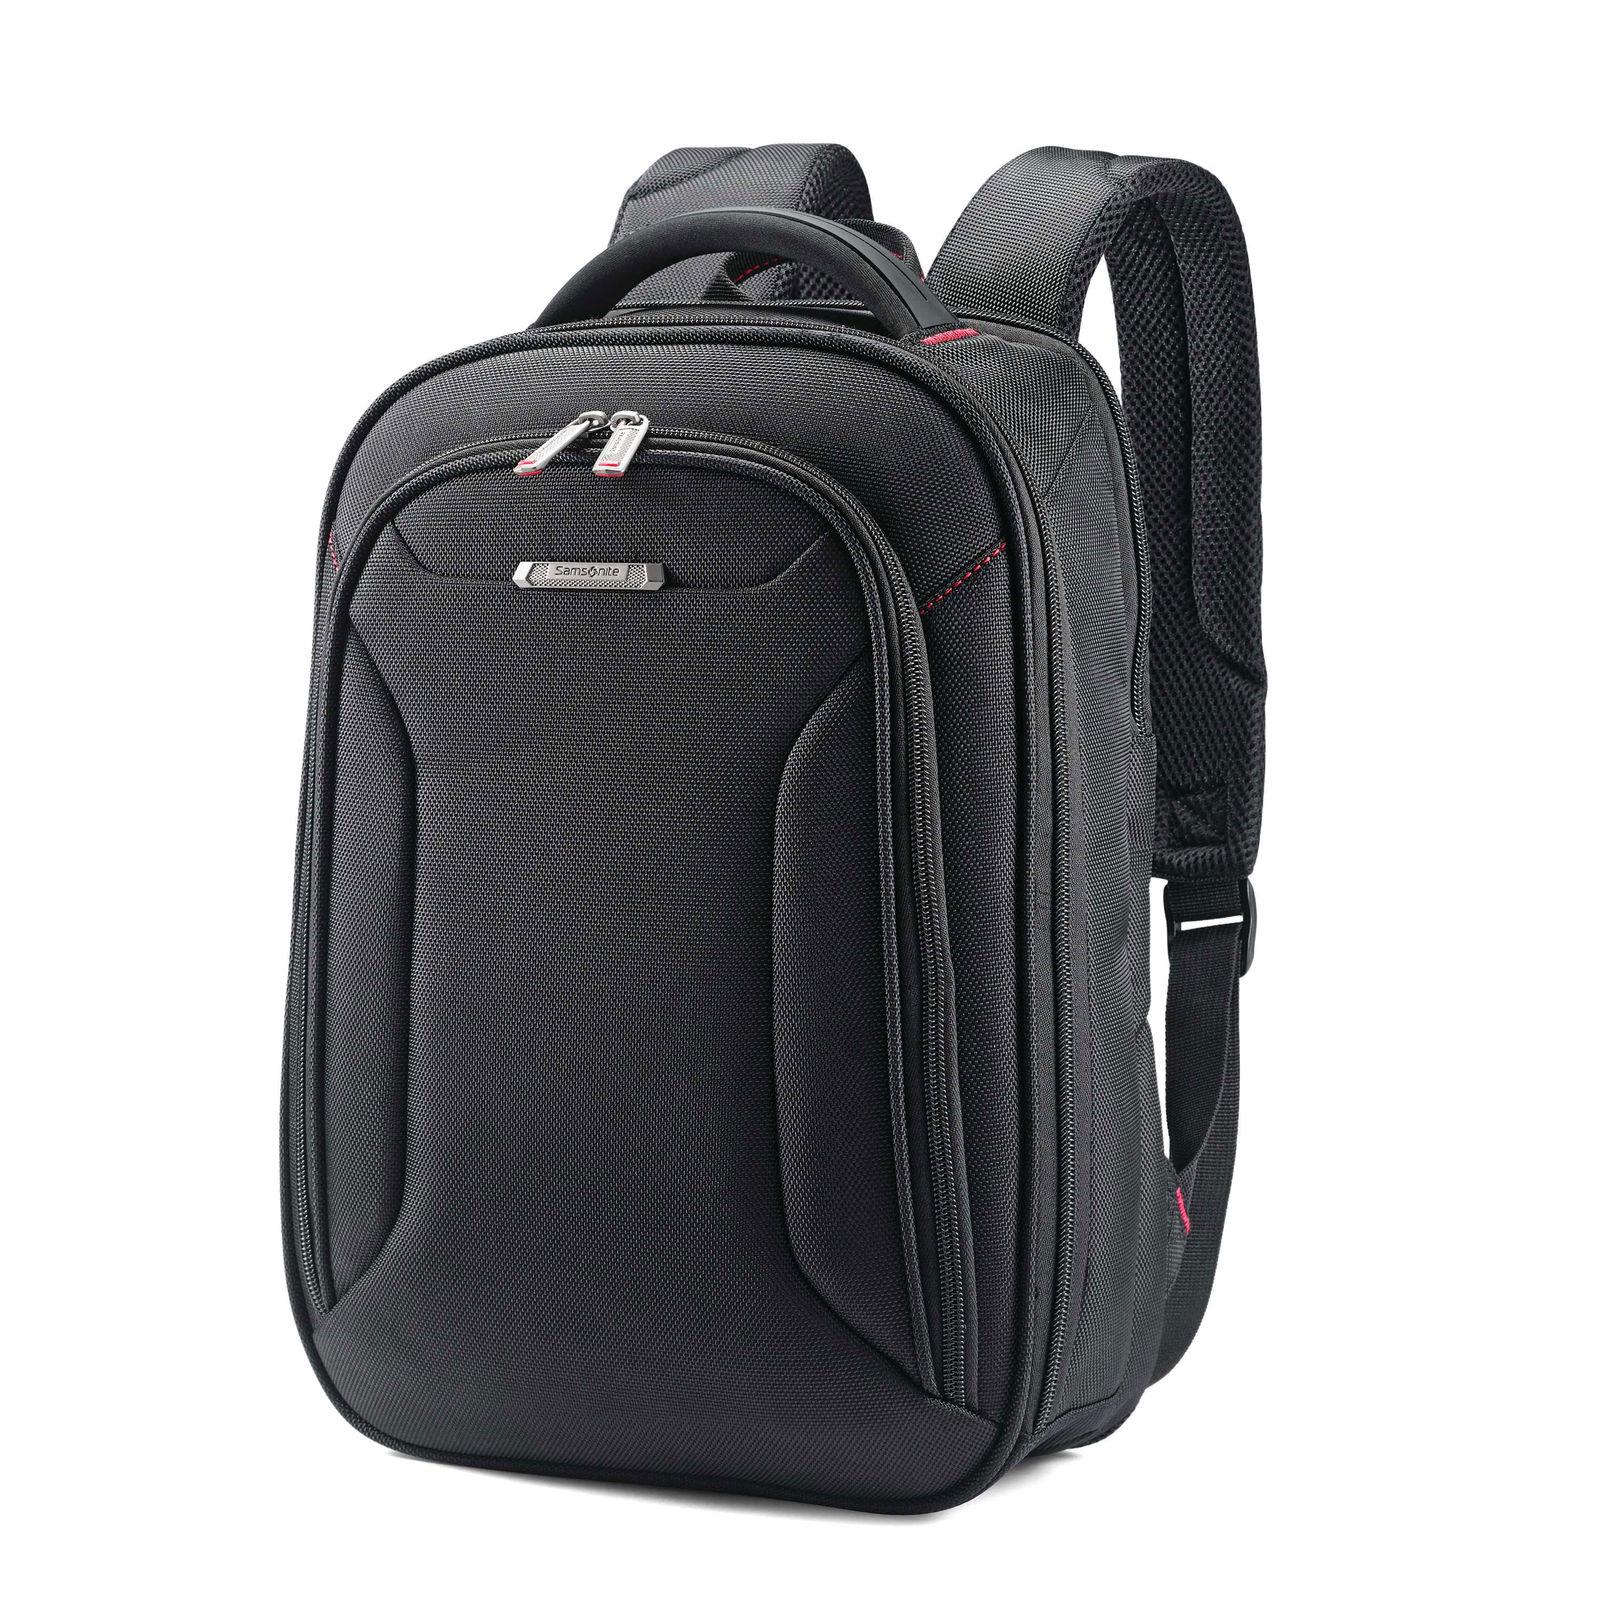 81e45e46d Samsonite Xenon 3.0 Small Backpack at eBay $27.99 w/ Free Shipping ...